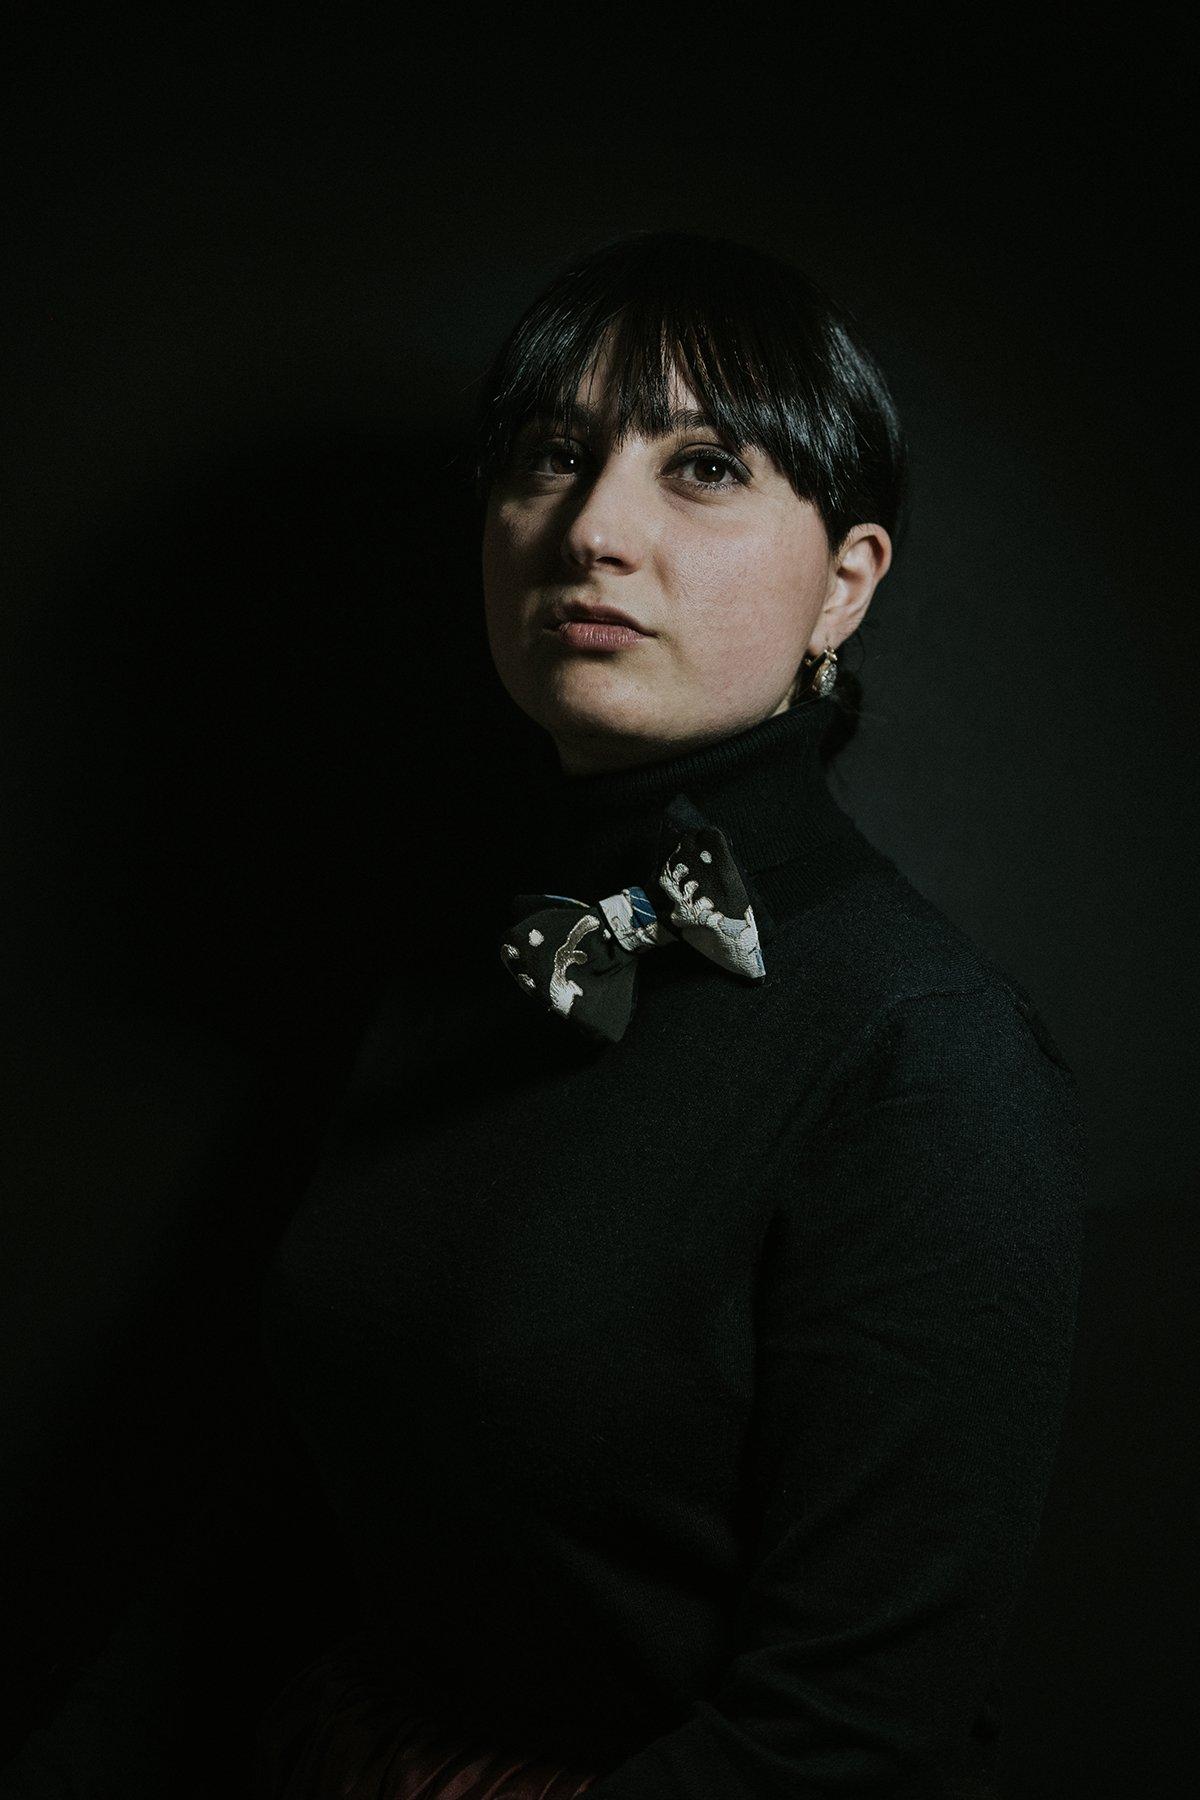 Angela Pinzaglia